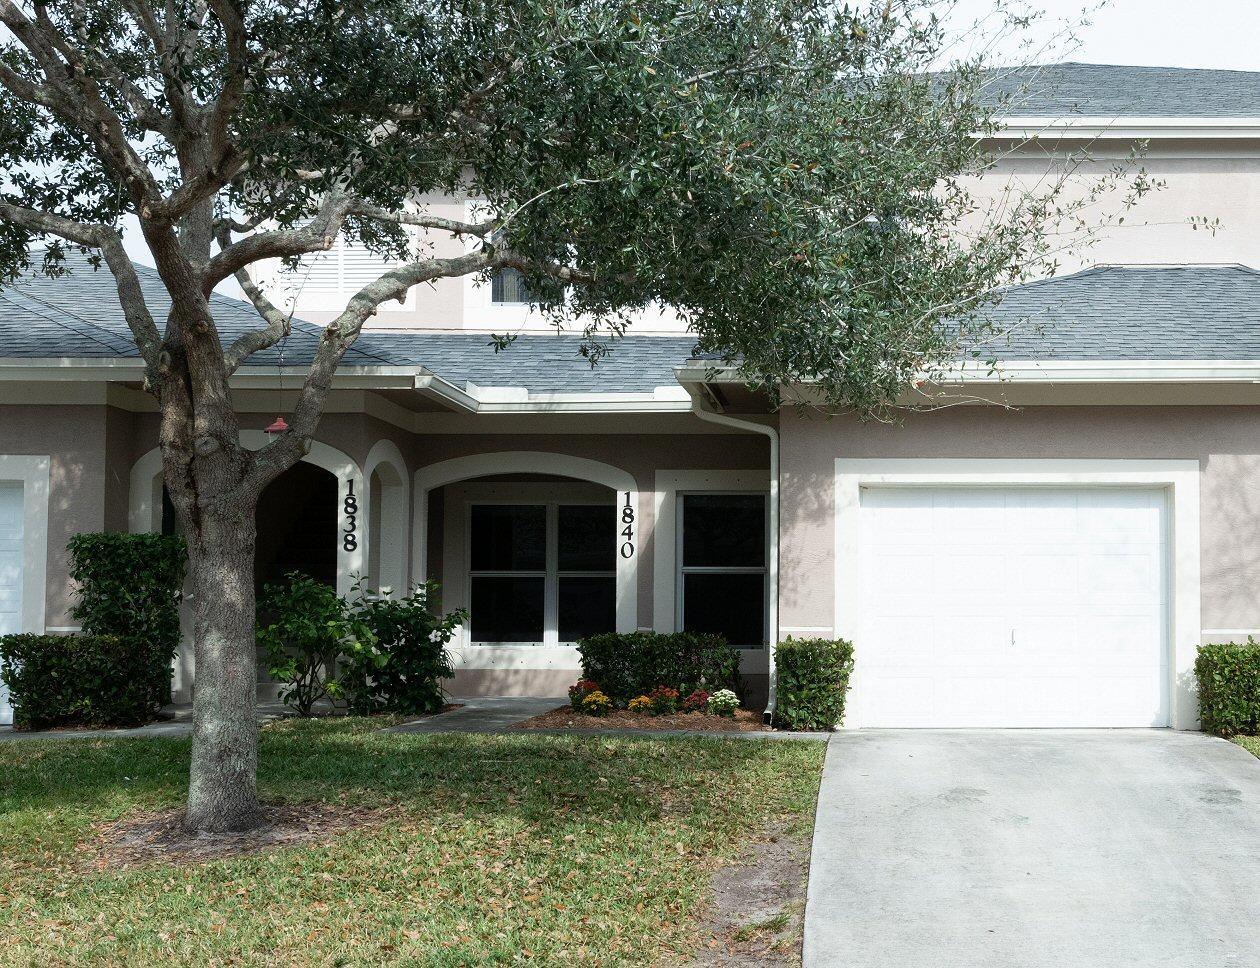 1840 Sandhill Crane Drive, Fort Pierce, FL 34982